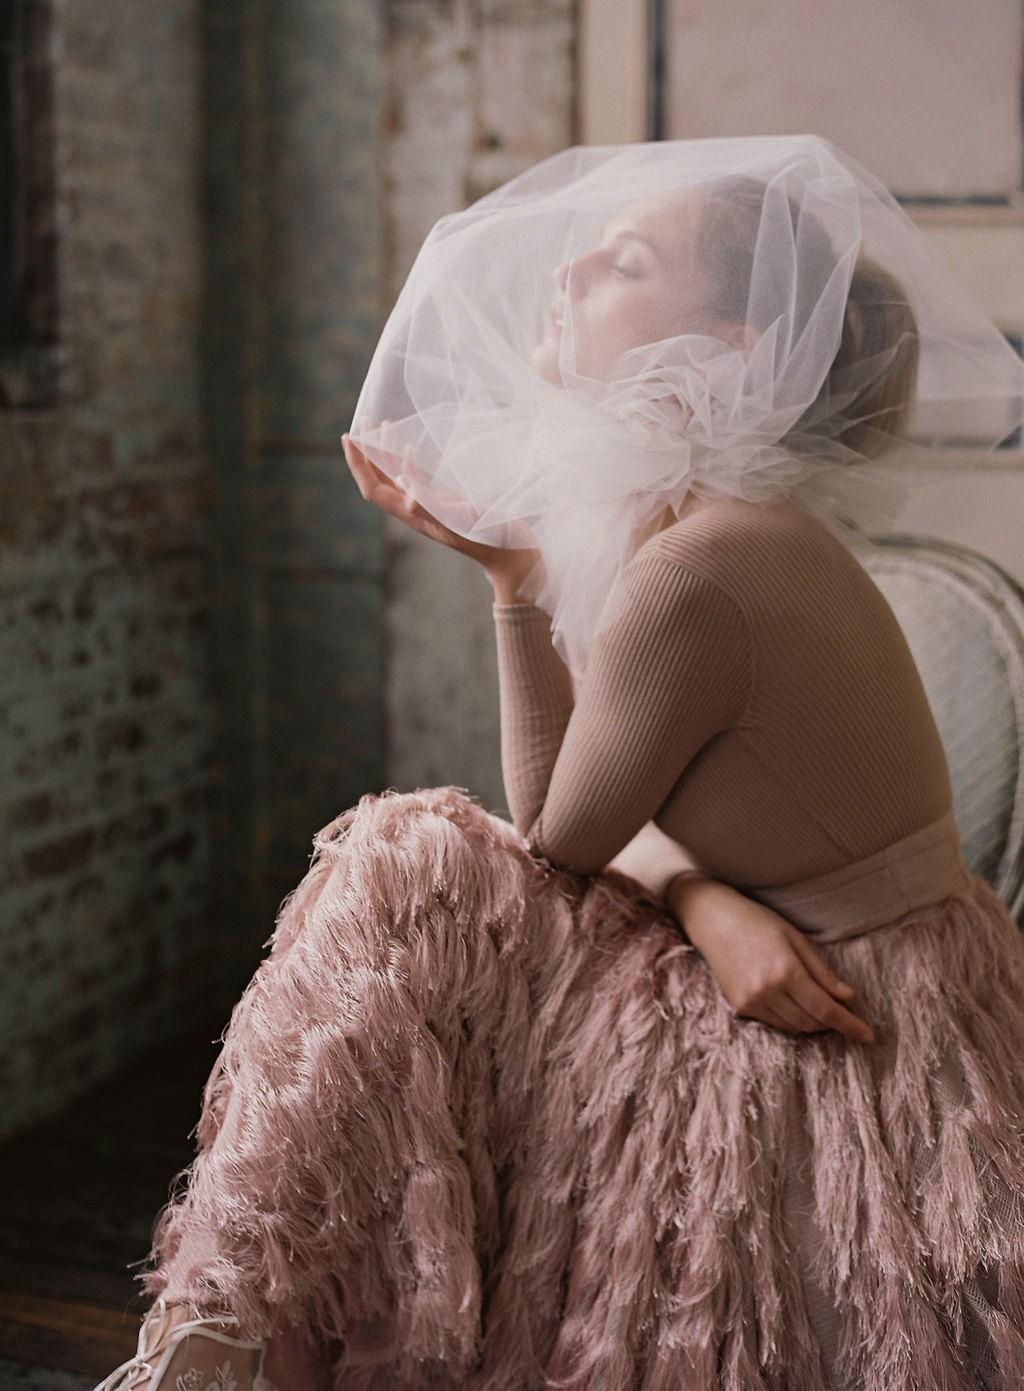 Our favorite Bridesmaids & Evening Shoes for the Fine Art Bride - Bella Belle Shoes